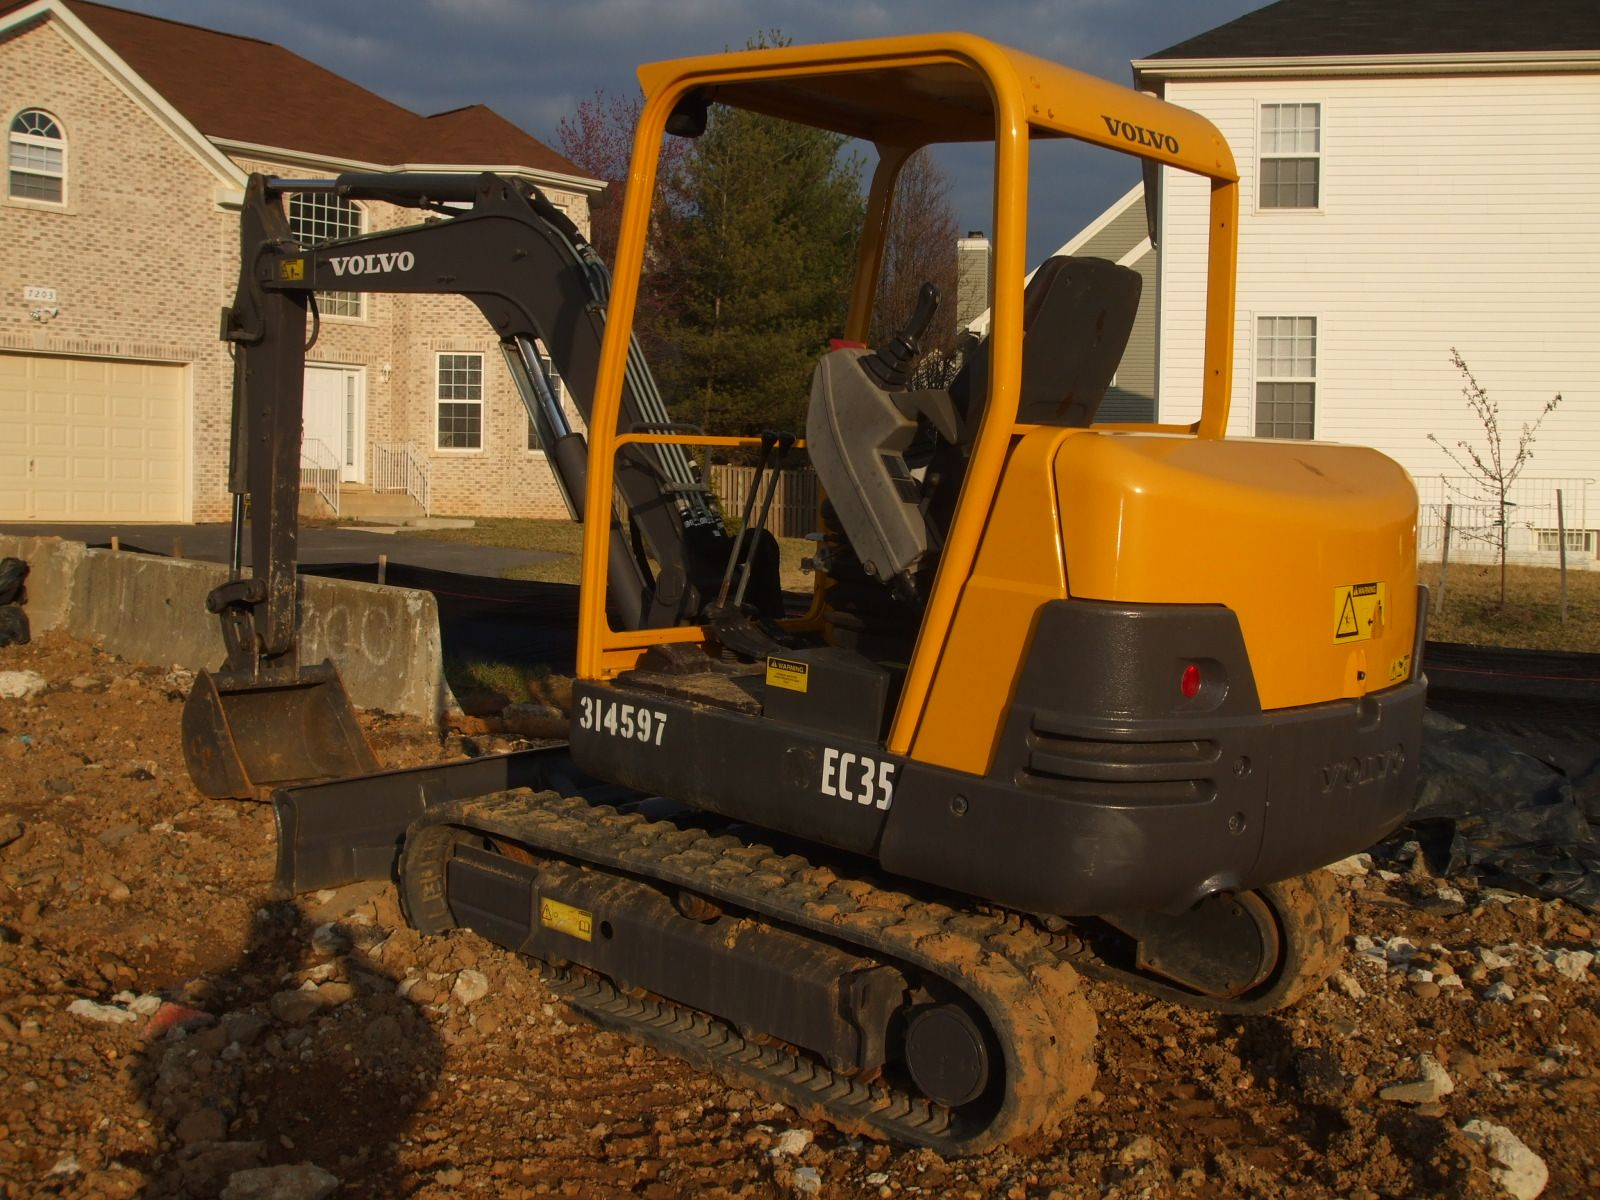 ... Array - volvo ec35 compact excavator workshop service repair manual  smartass rh landtantdenzrean relaxedbootsuksaleonline info